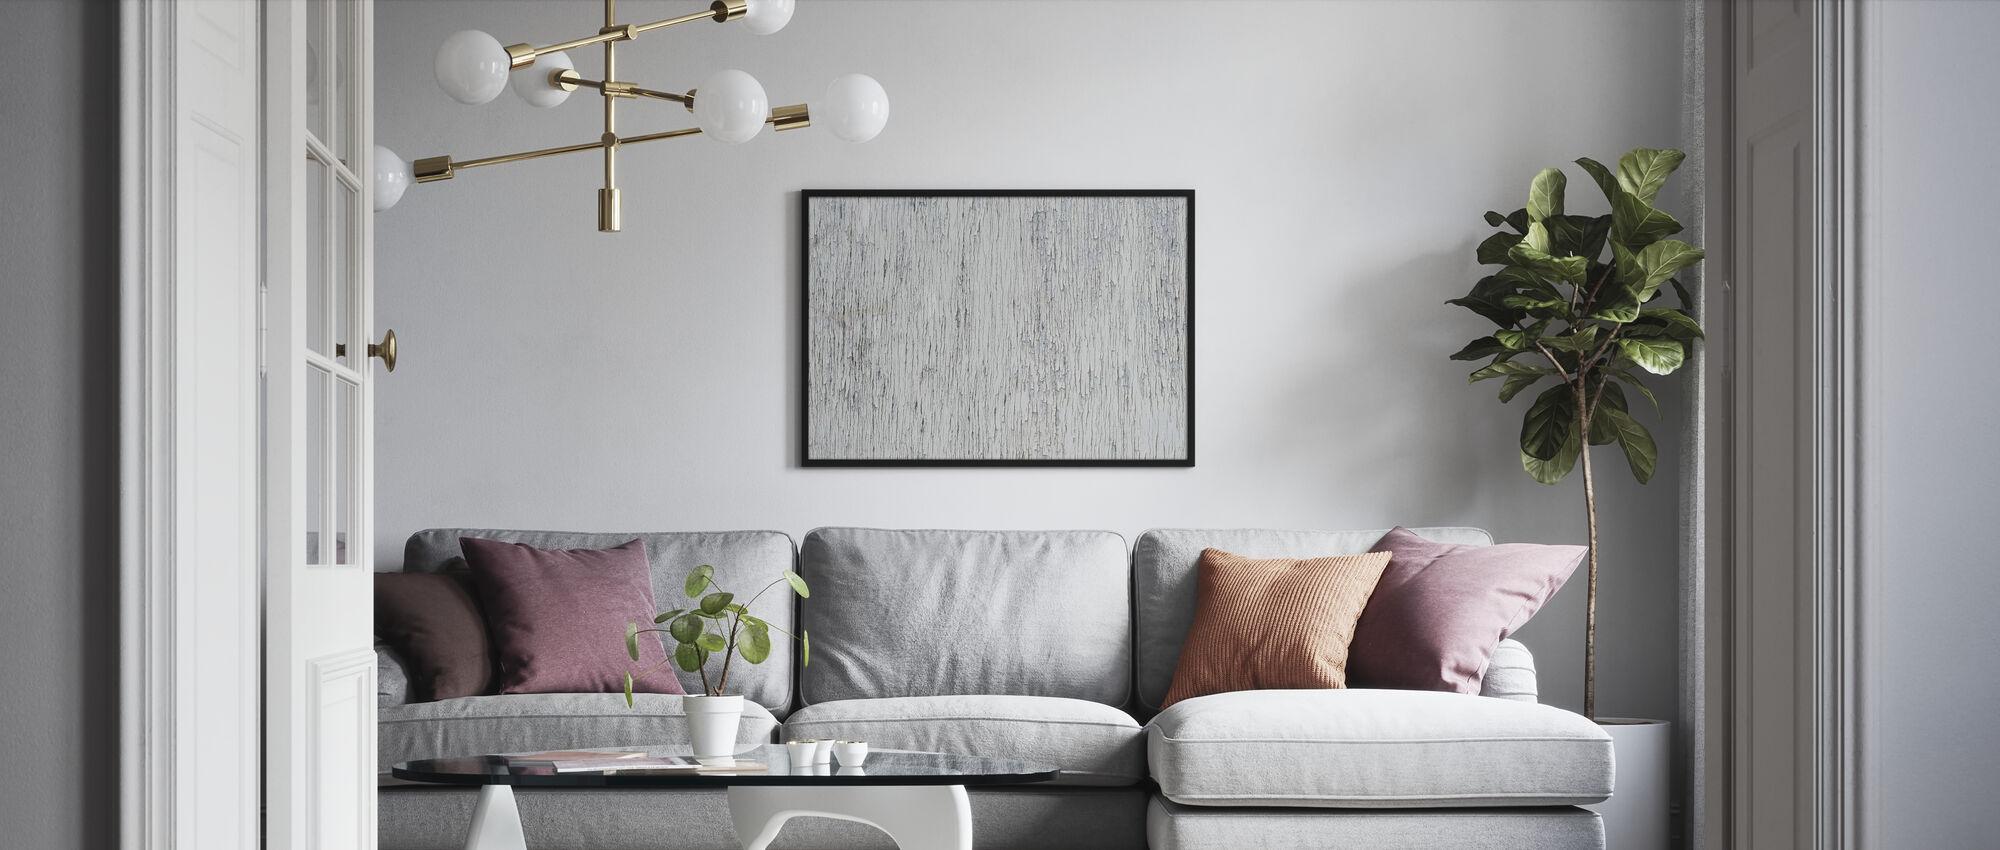 Sprukket hvit maling - Innrammet bilde - Stue